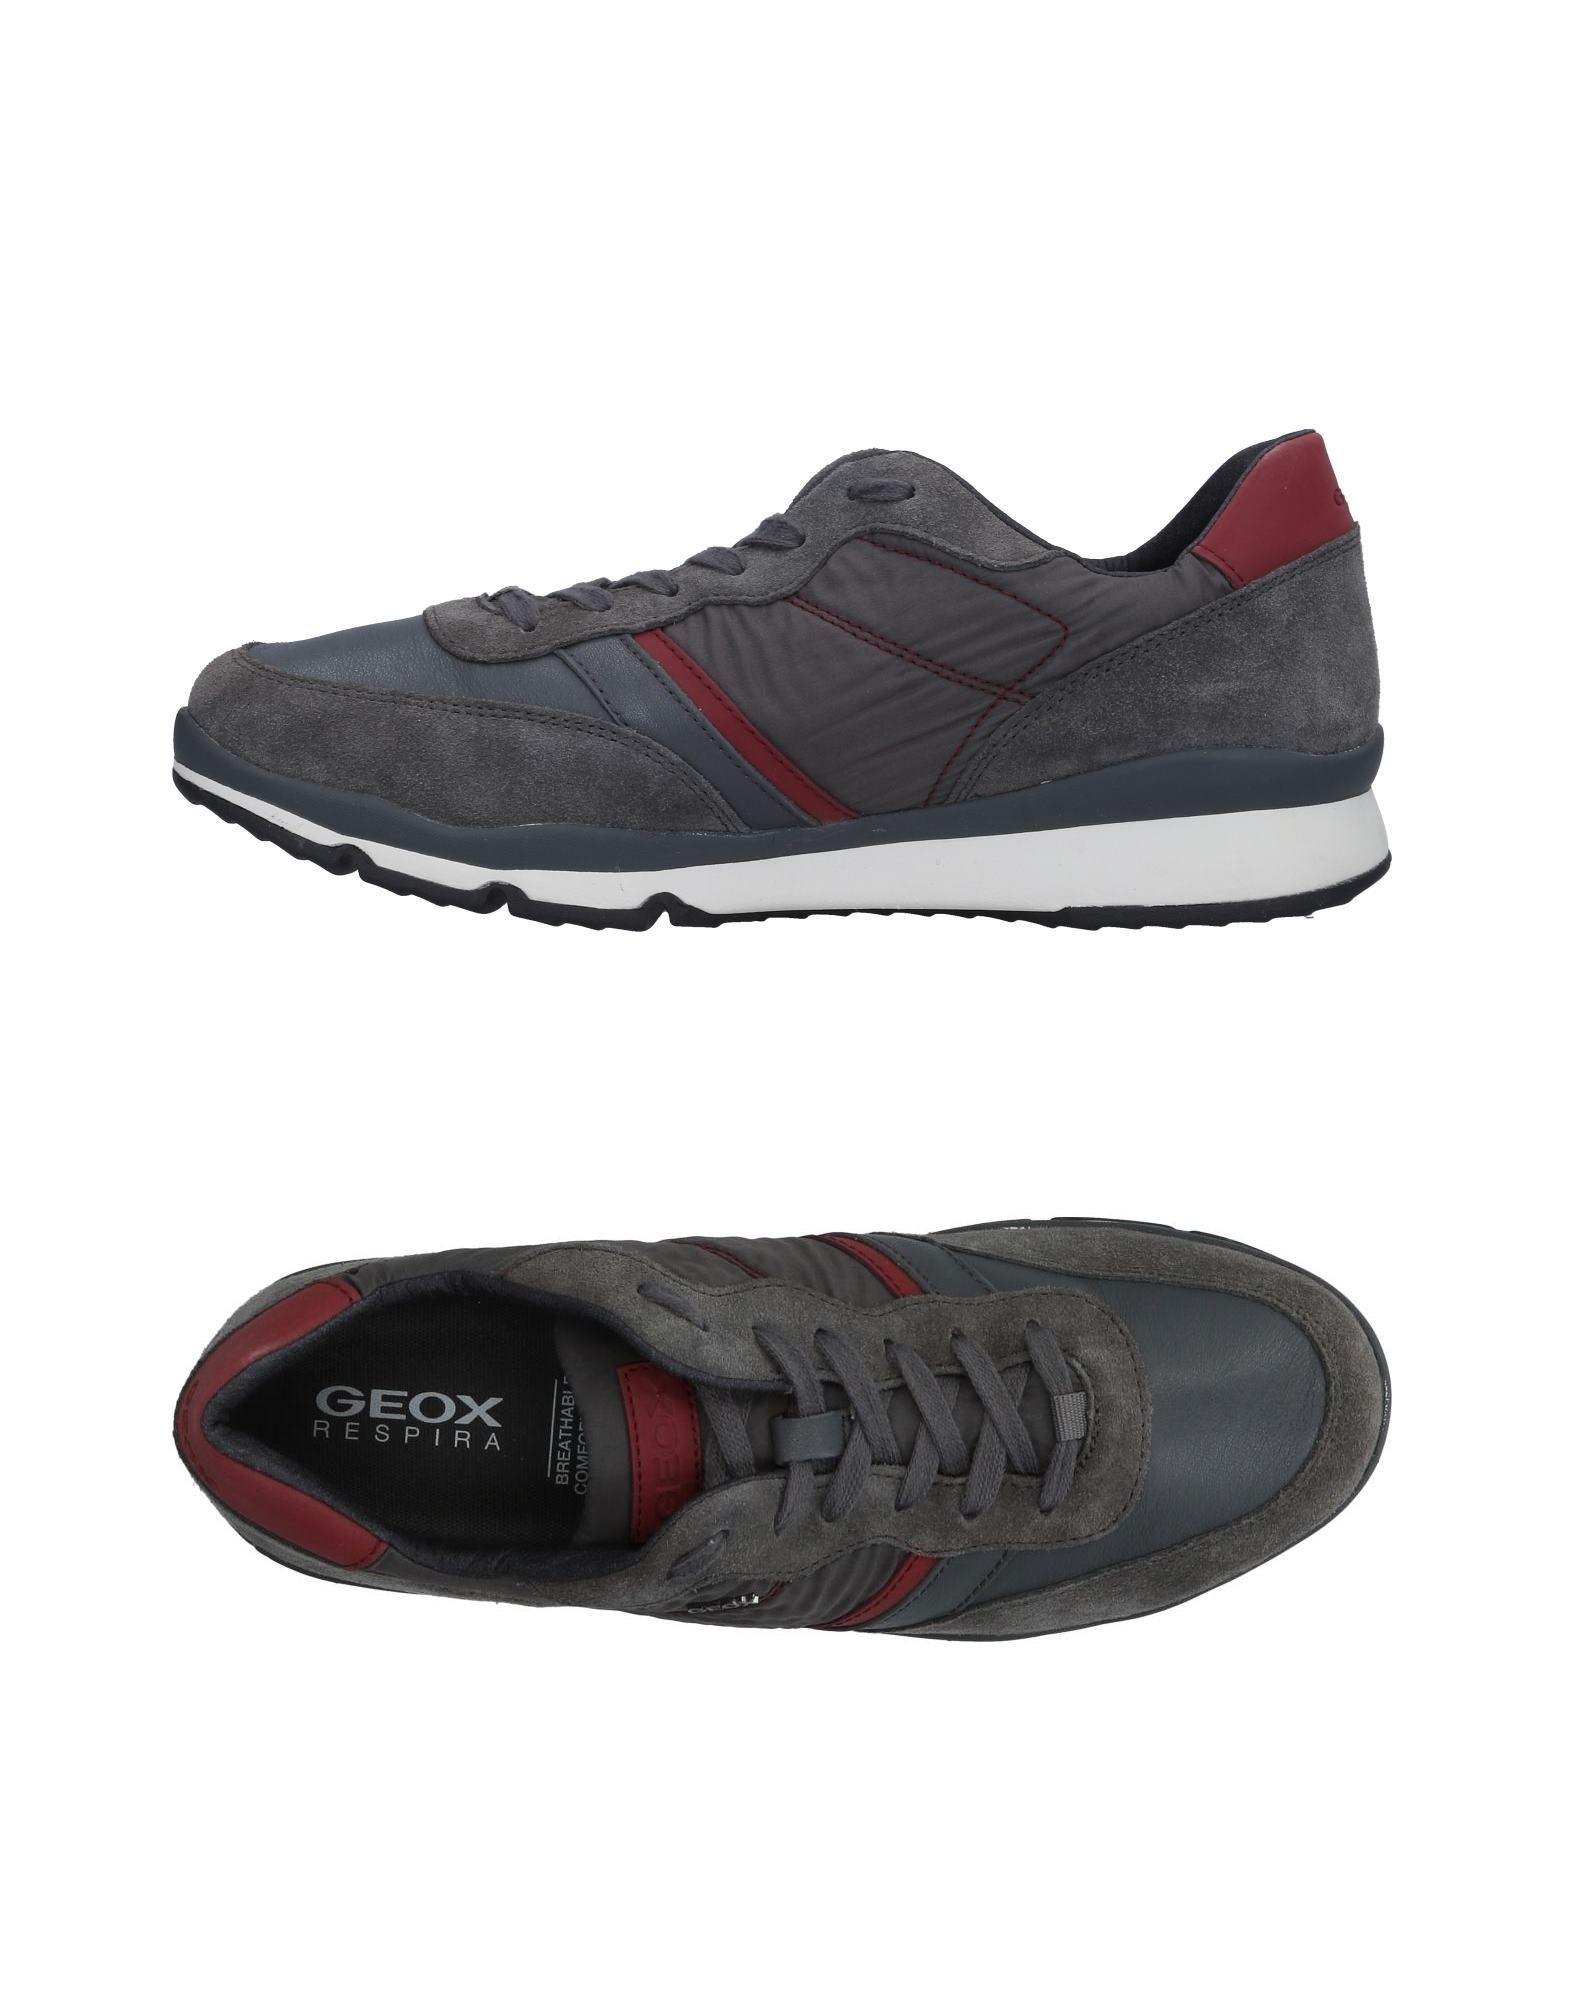 Sneakers Geox Homme - Sneakers Geox  Bleu foncé Confortable et belle